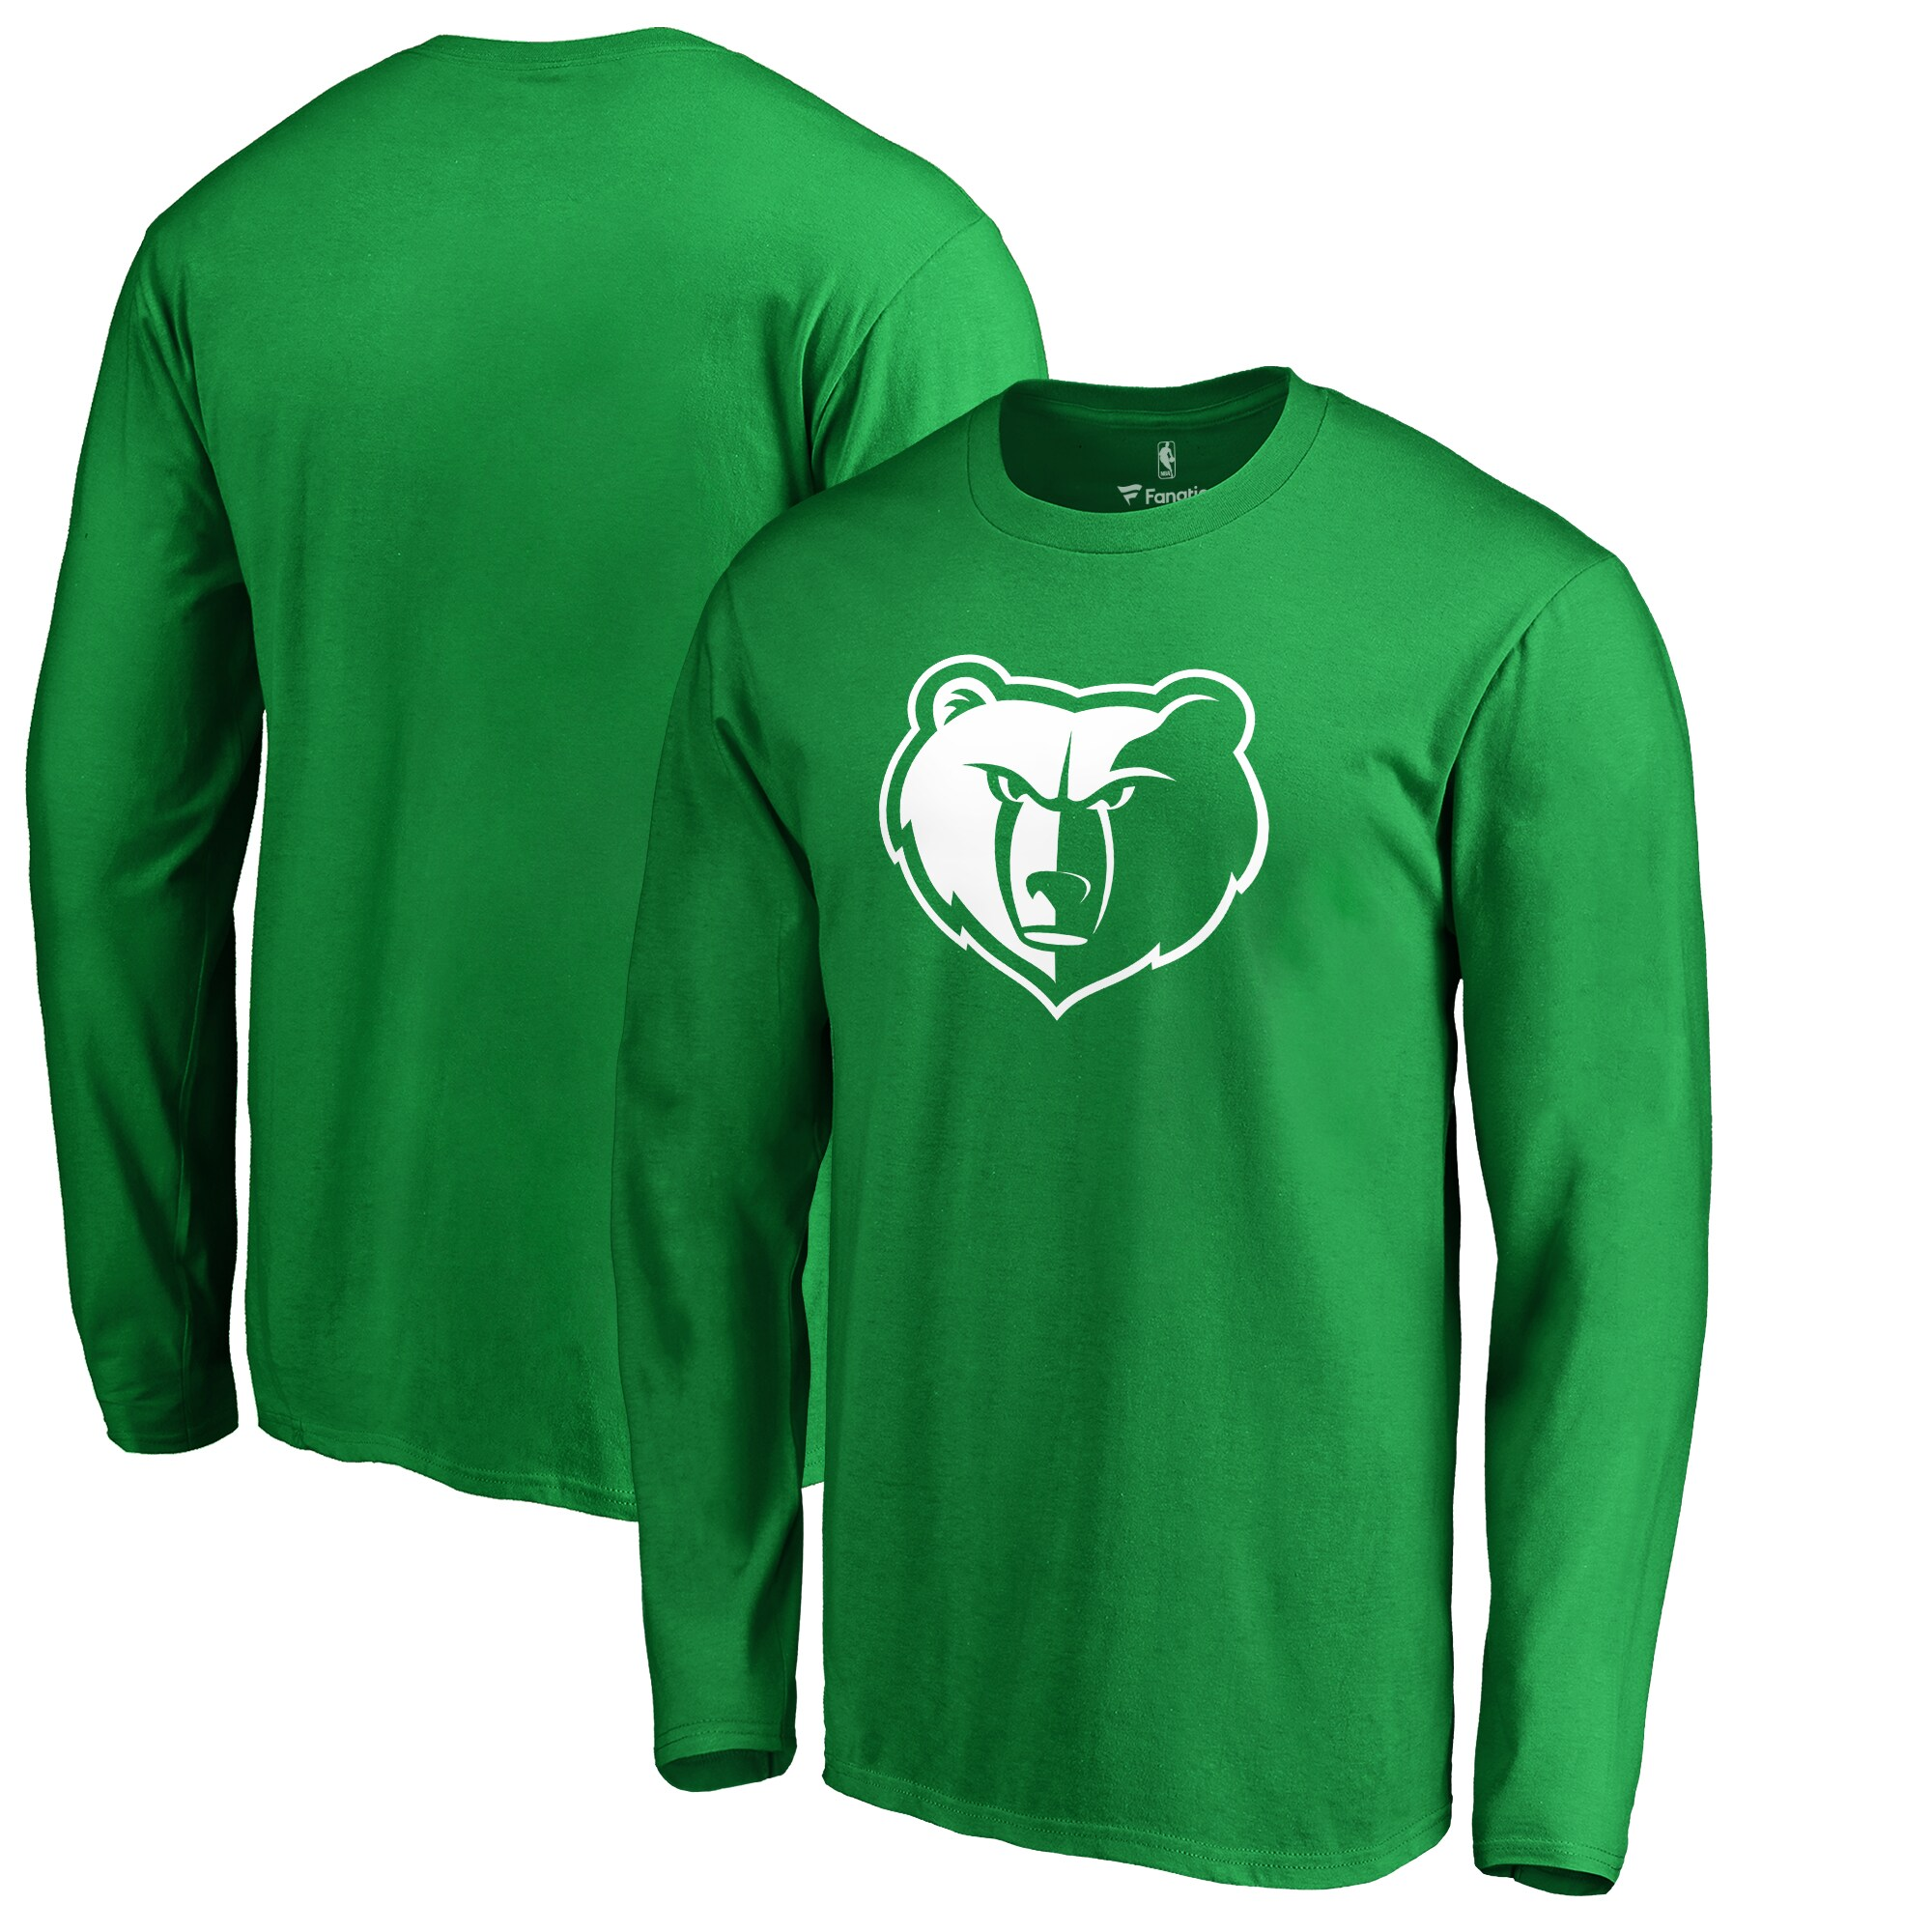 Memphis Grizzlies Fanatics Branded St. Patrick's Day White Logo Long Sleeve T-Shirt - Green